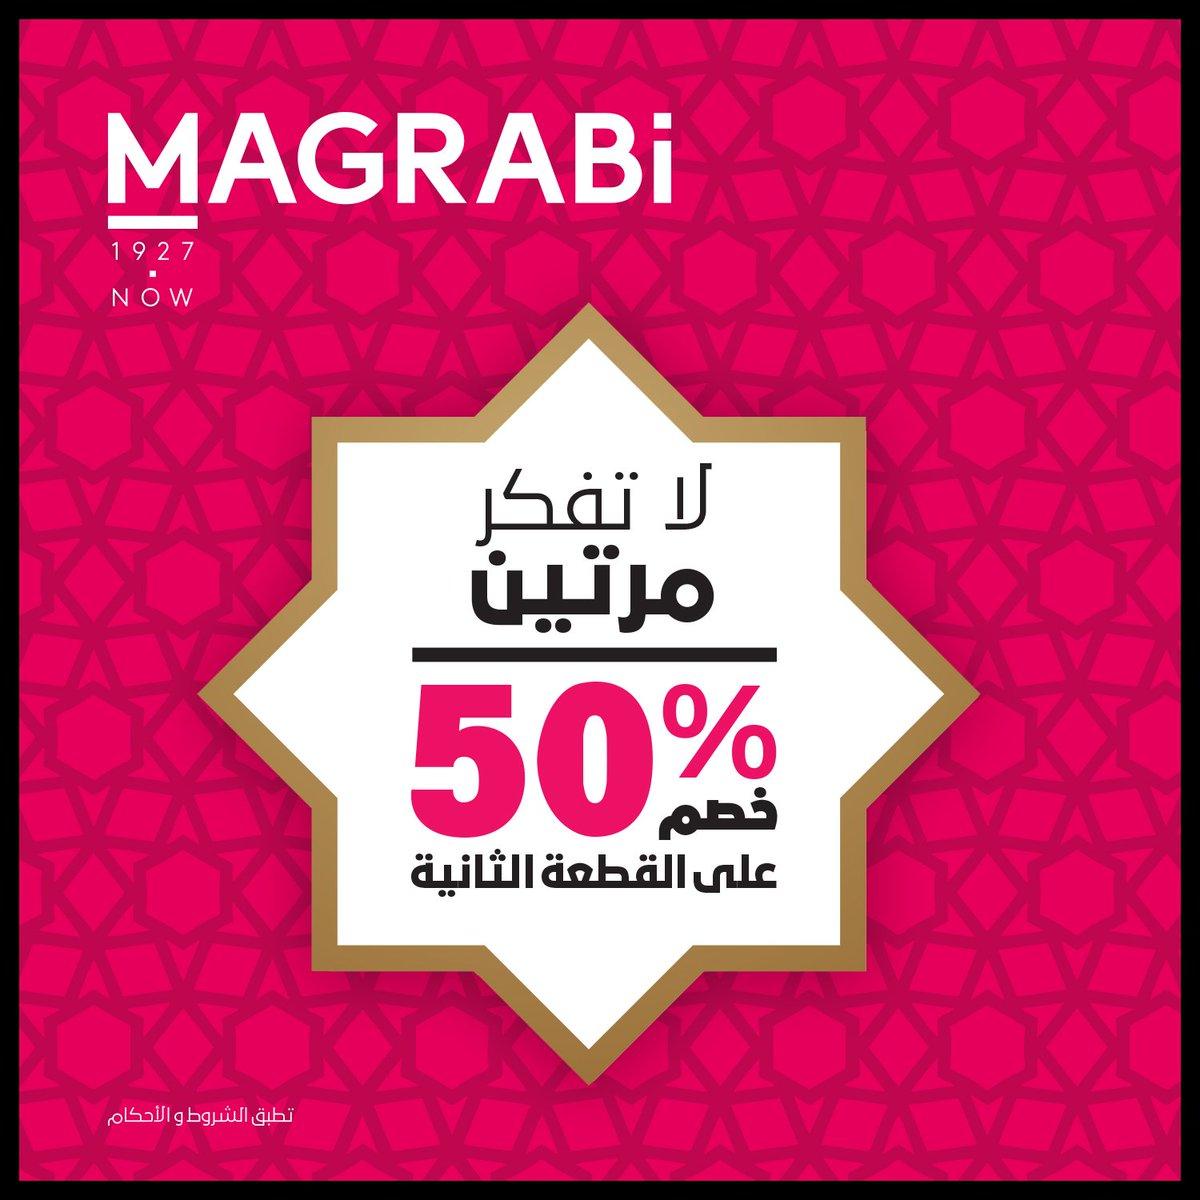 86db207a9 #عروض MagrabiOpt: لا تفكر مرتين خصم 50% علي القطعة الثانية #مغربي_للبصريات  pic.twitter.com/uhwIMA4ggi